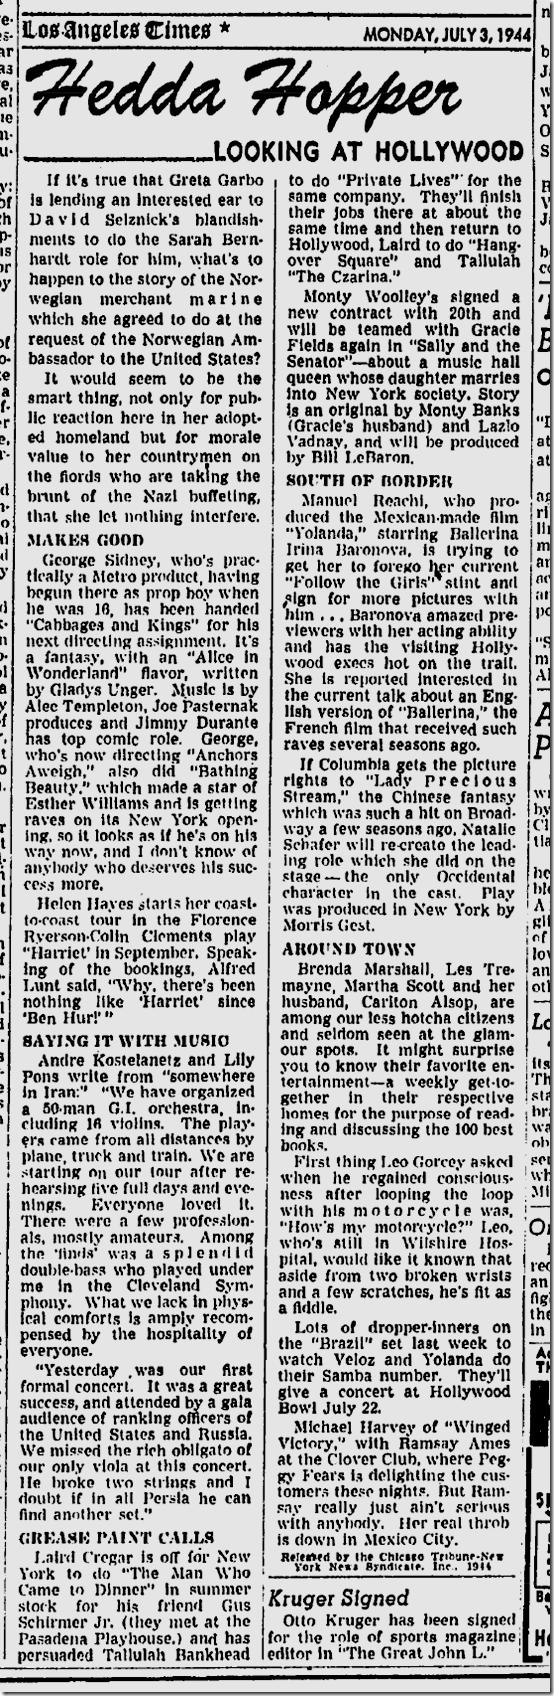 July 3, 1944, Hedda Hopper